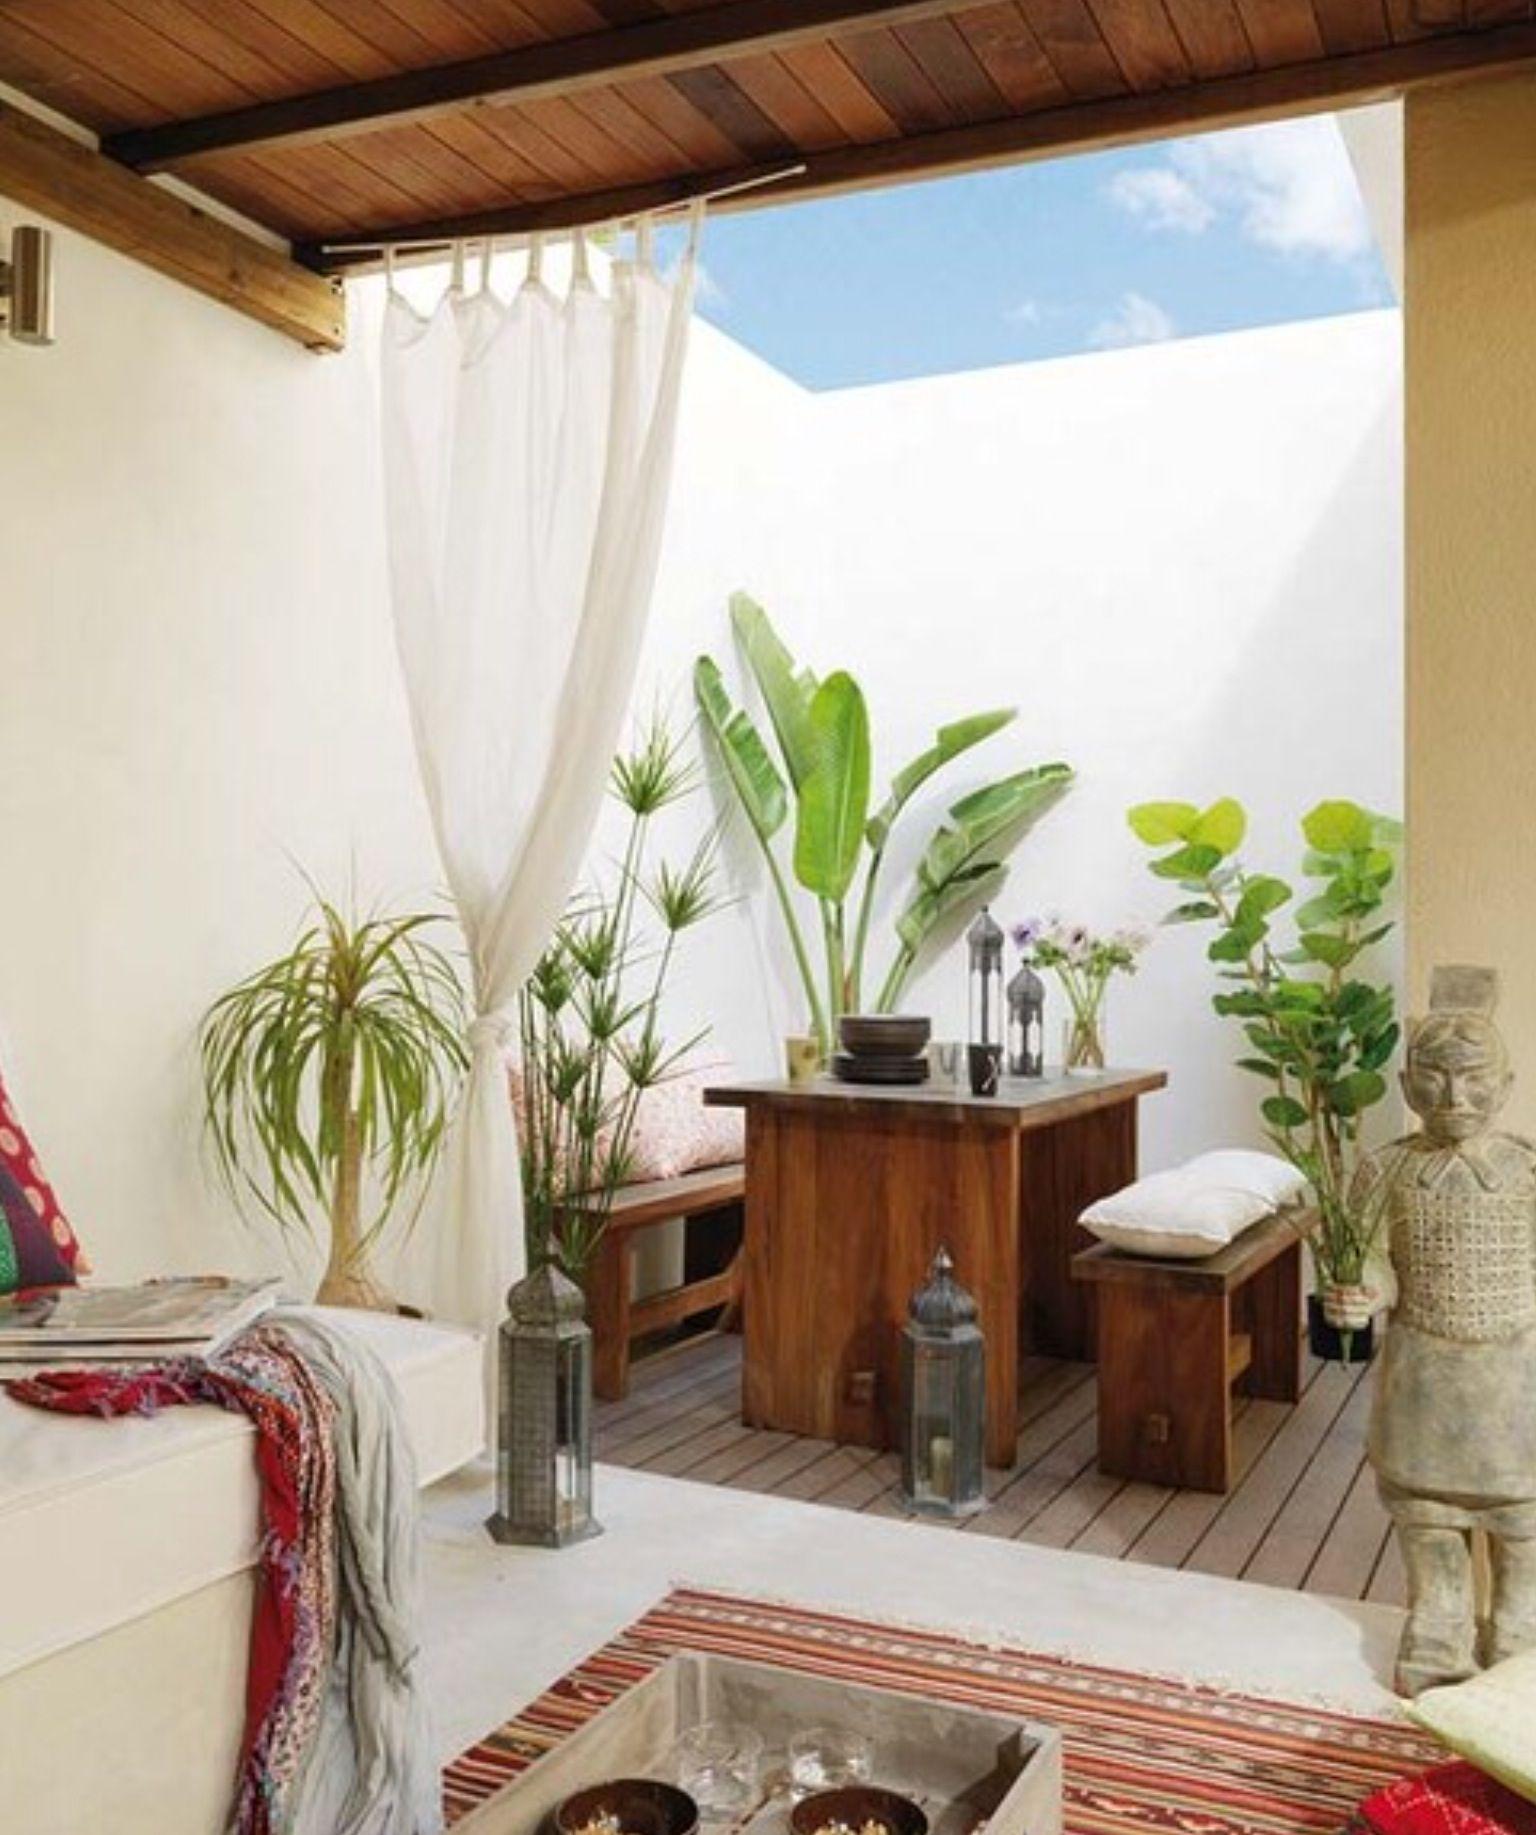 Eclectic decks and patios decks exterors eclectic patios